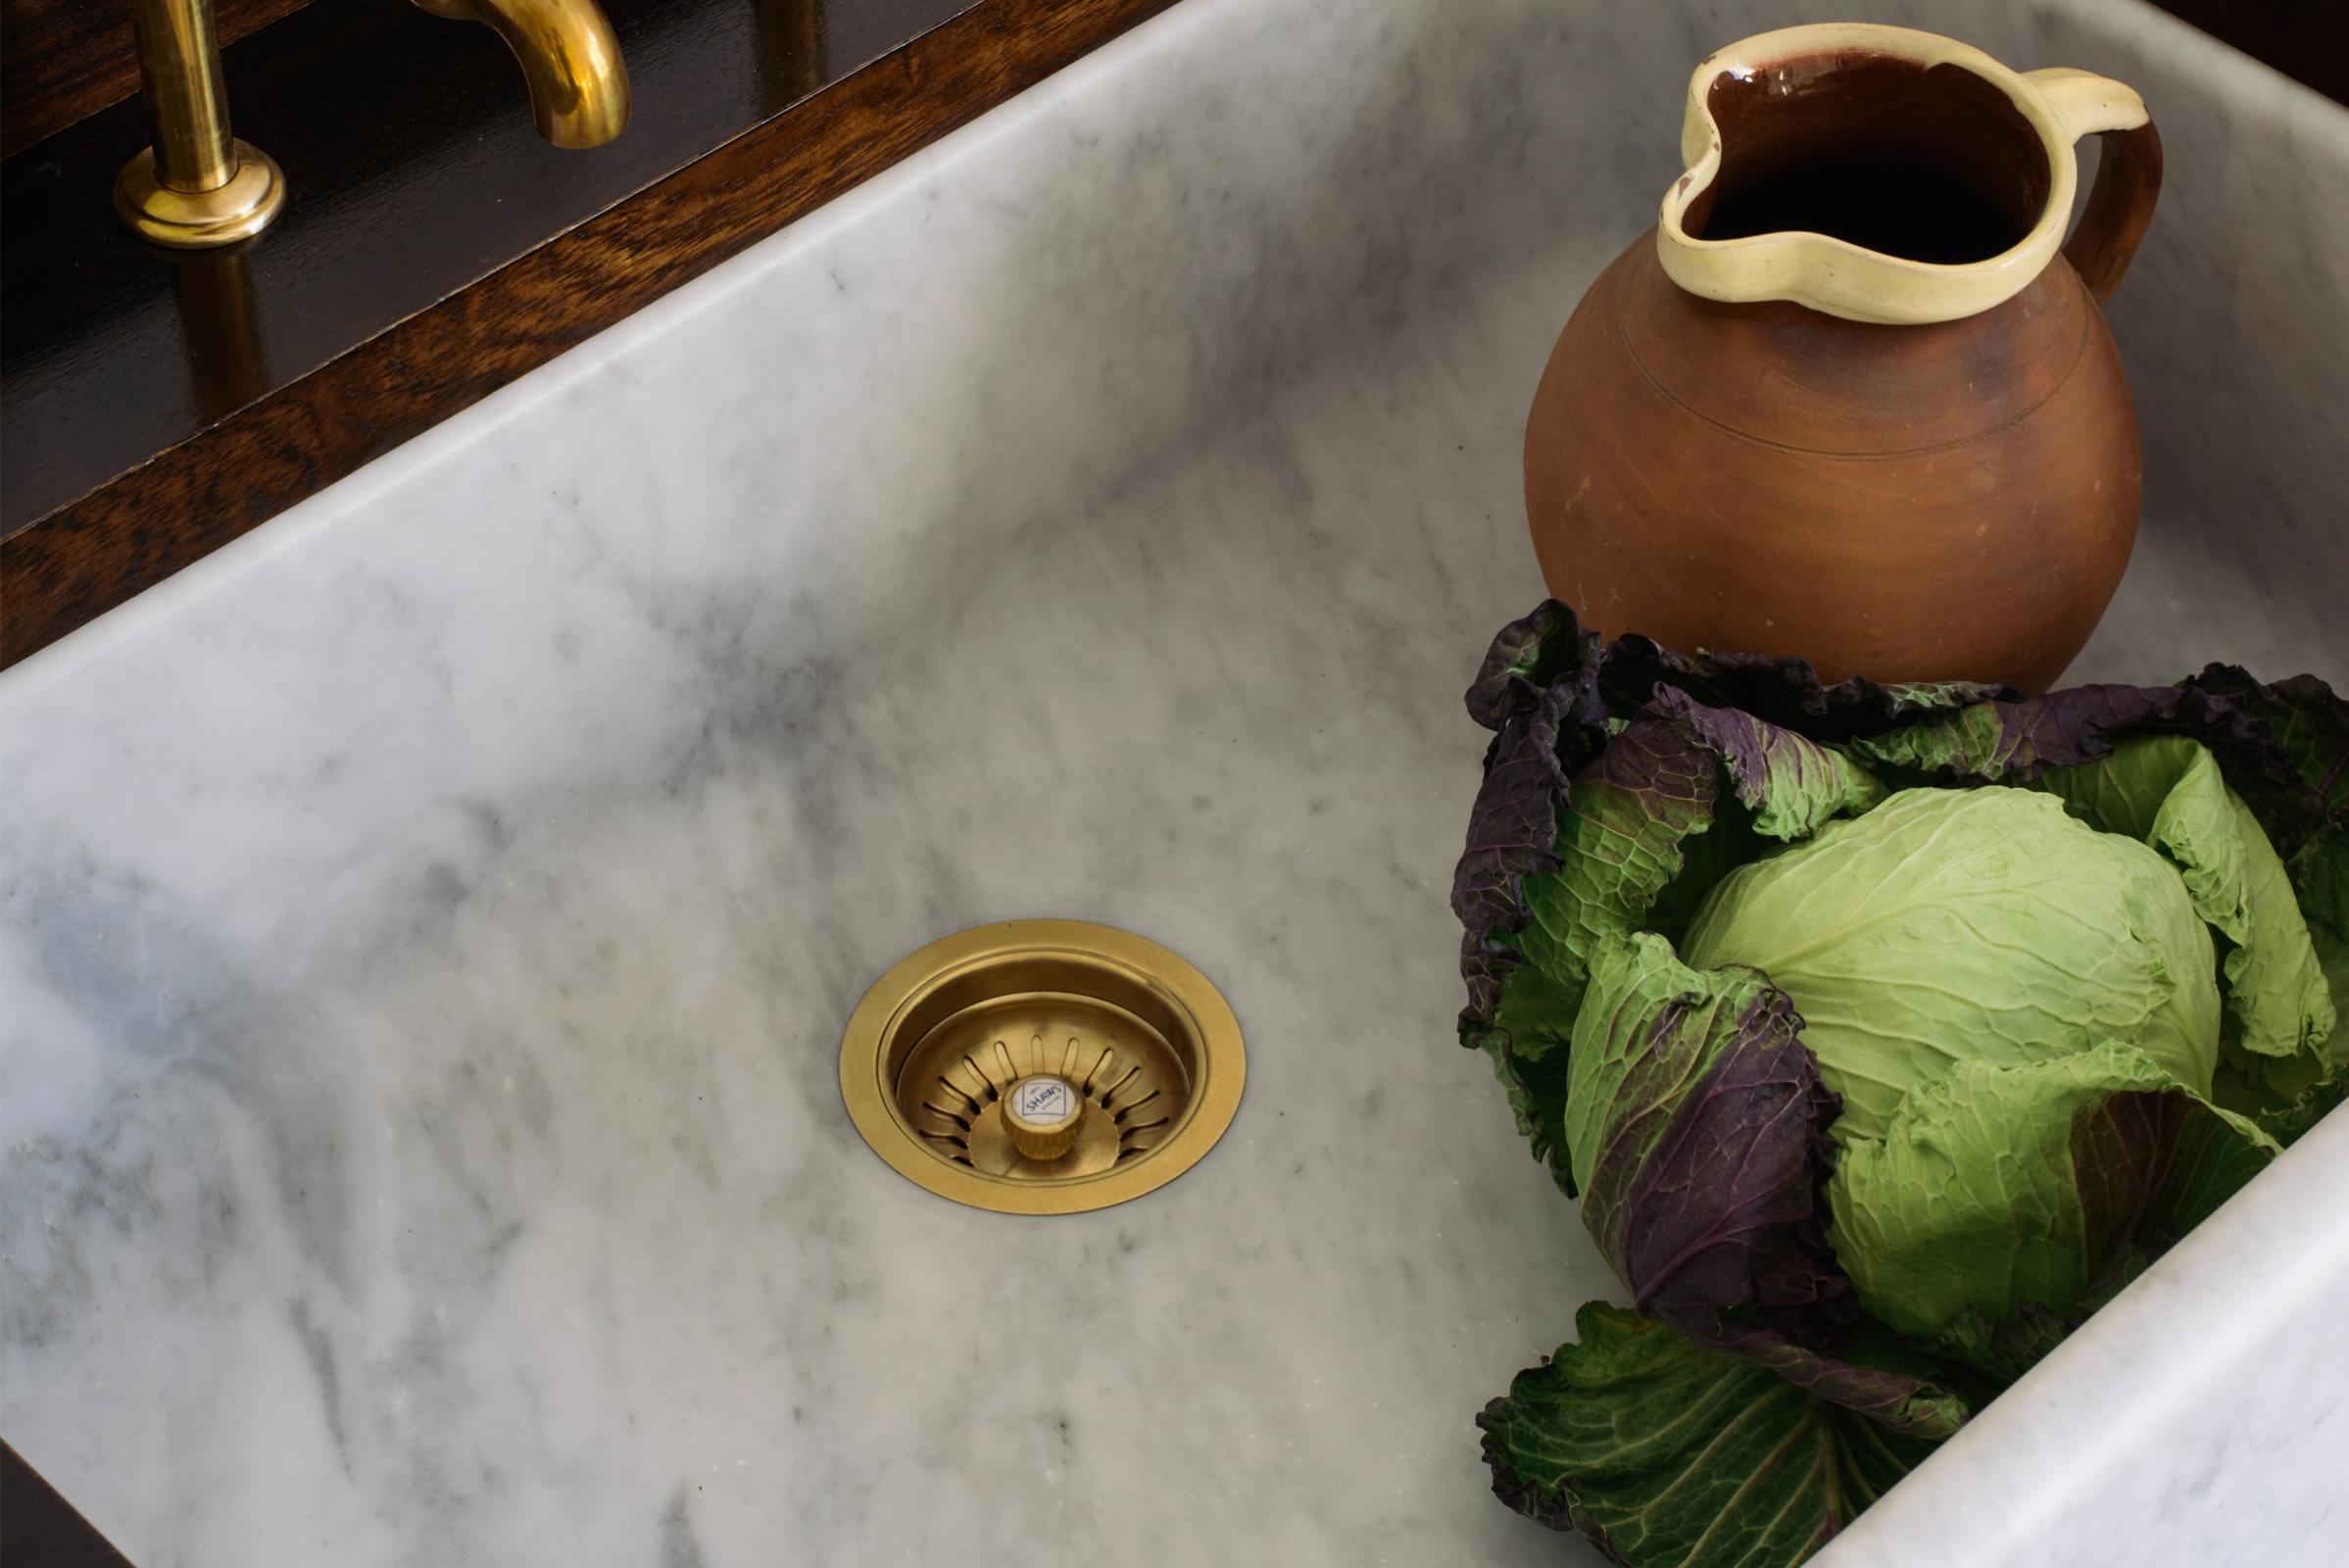 Tuscan Farmhouse 31 1/2'' Single Marble Sink photo 2